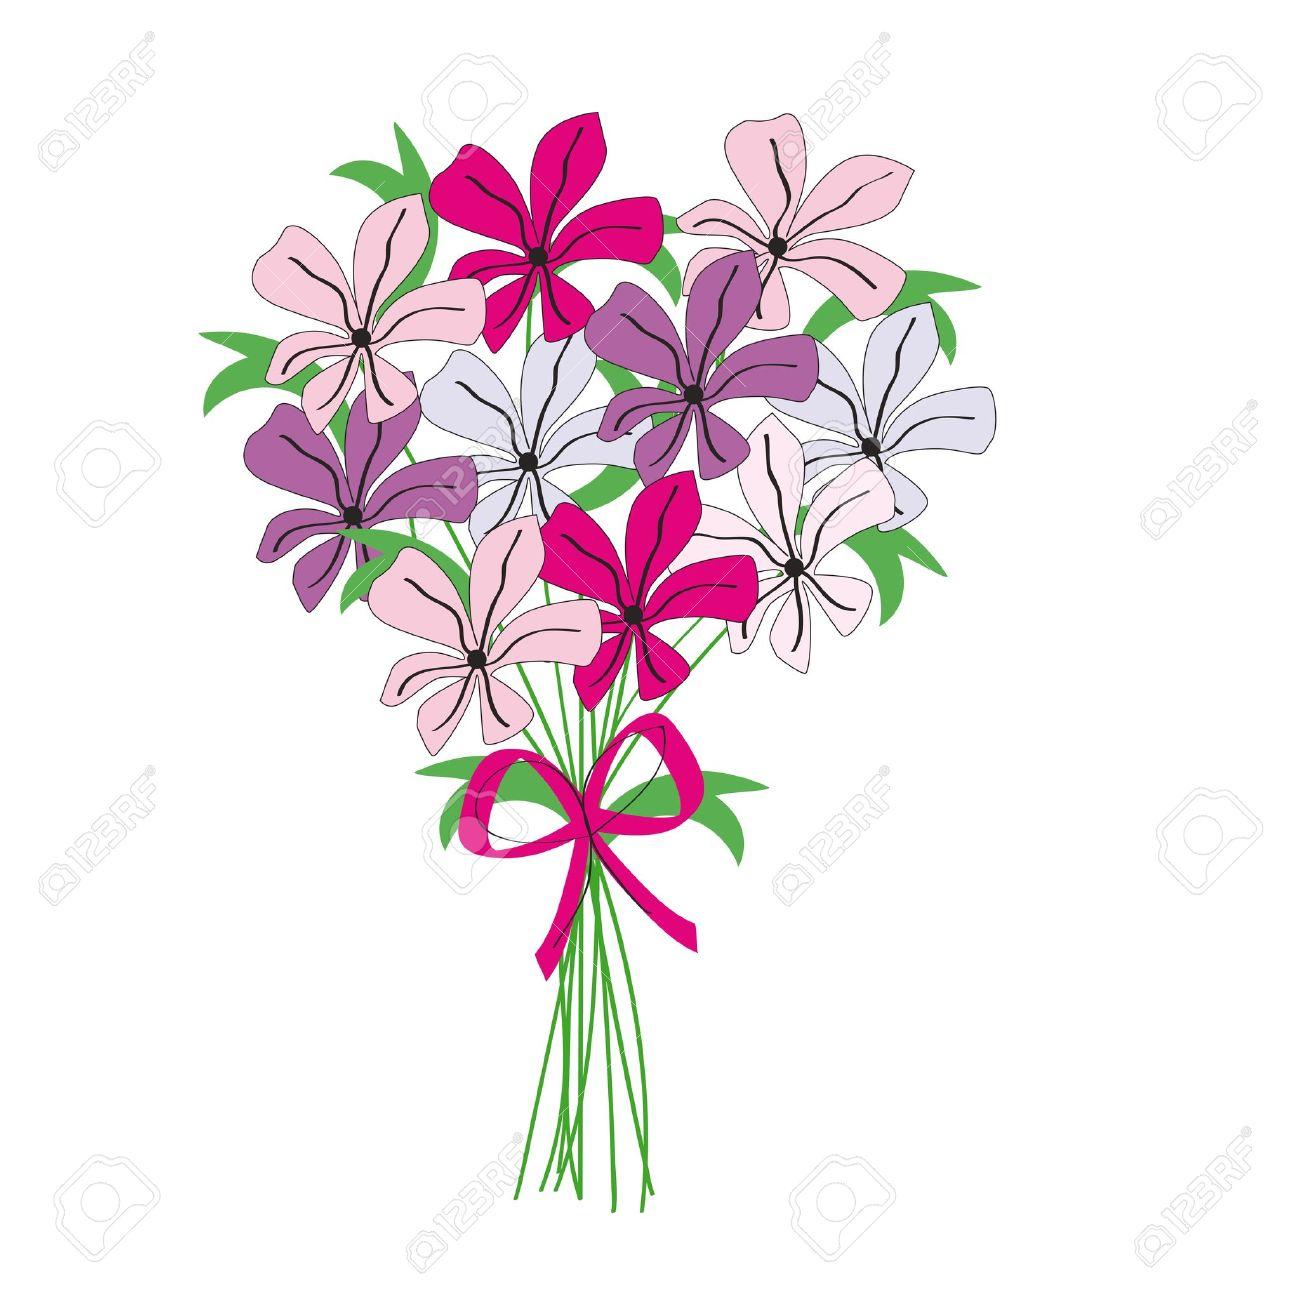 Types of Flowers - 170 Flower Names